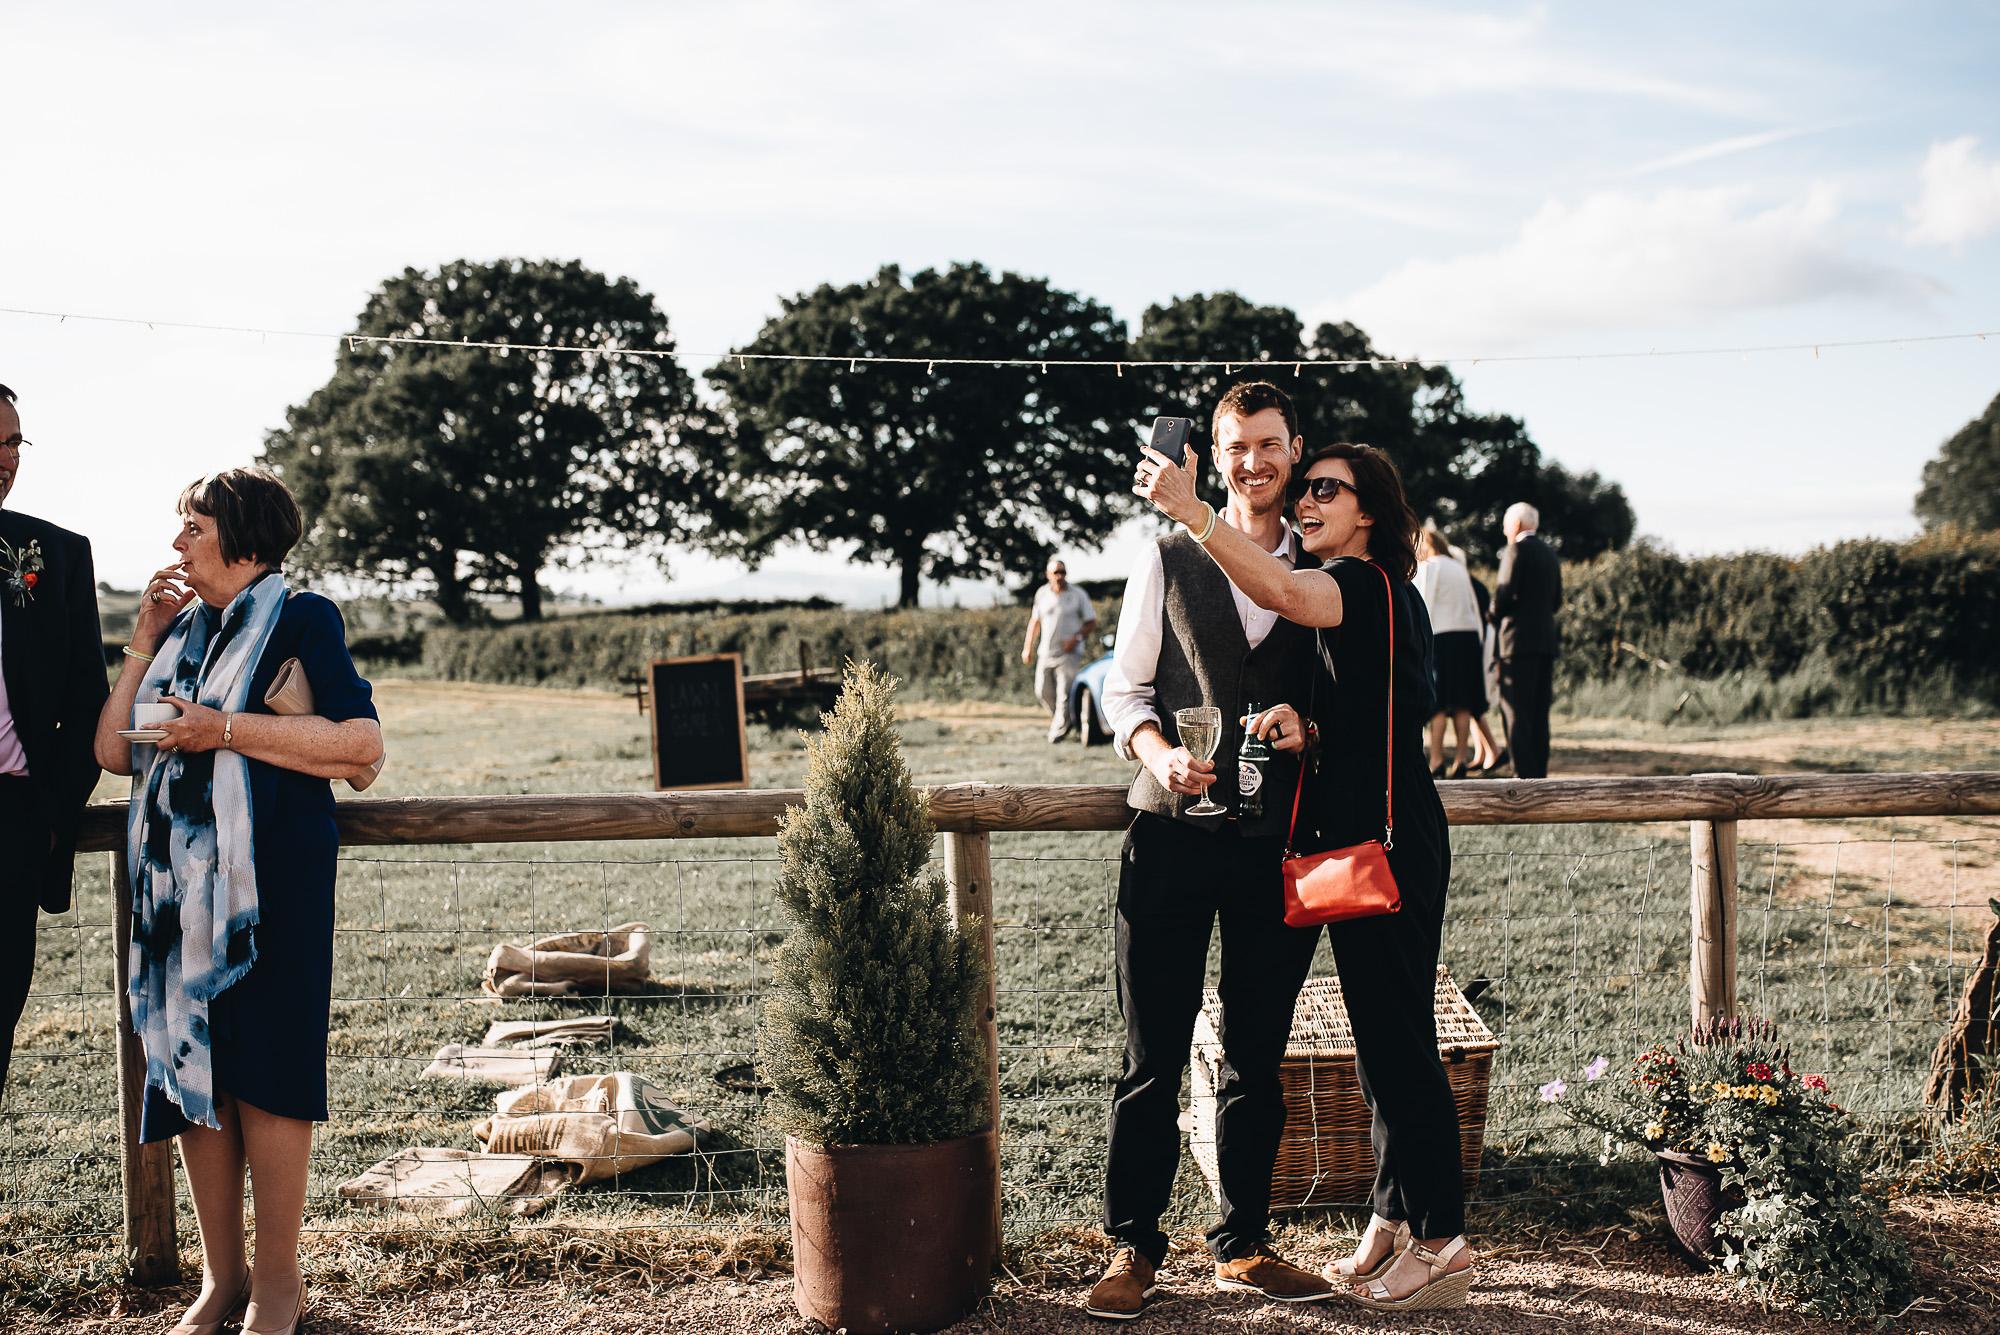 OurBeautifulAdventure-MaesbrookWedding-Lauren&Gareth-Blog-WebSize-7587.jpg